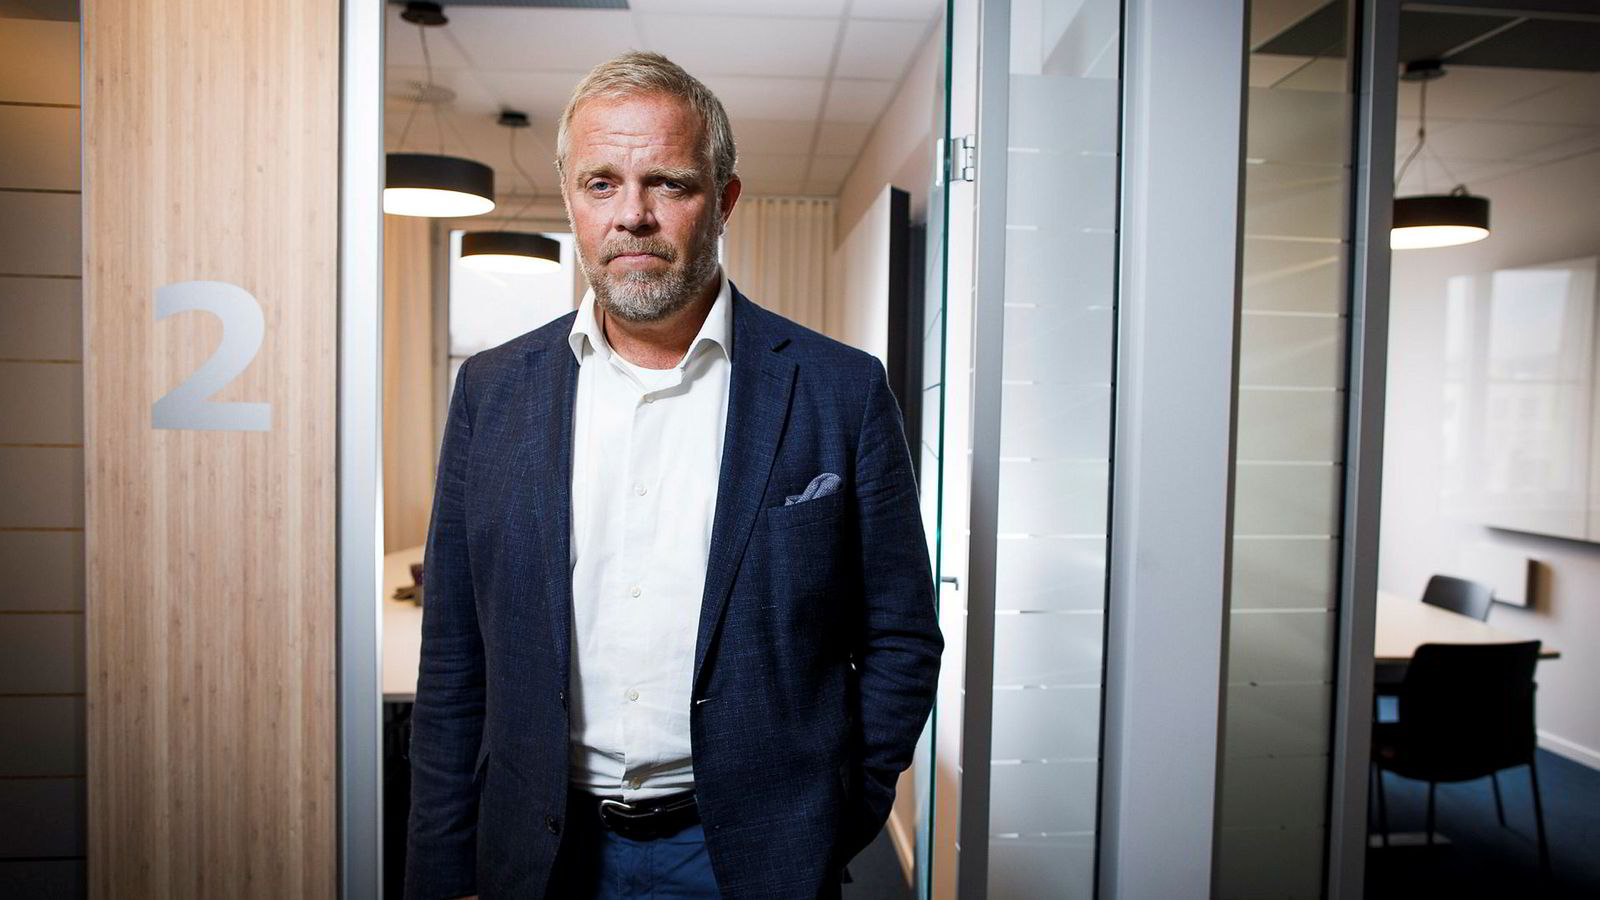 Advokat Jon Wessel-Aas i Bing Hodneland advokatselskap DA.